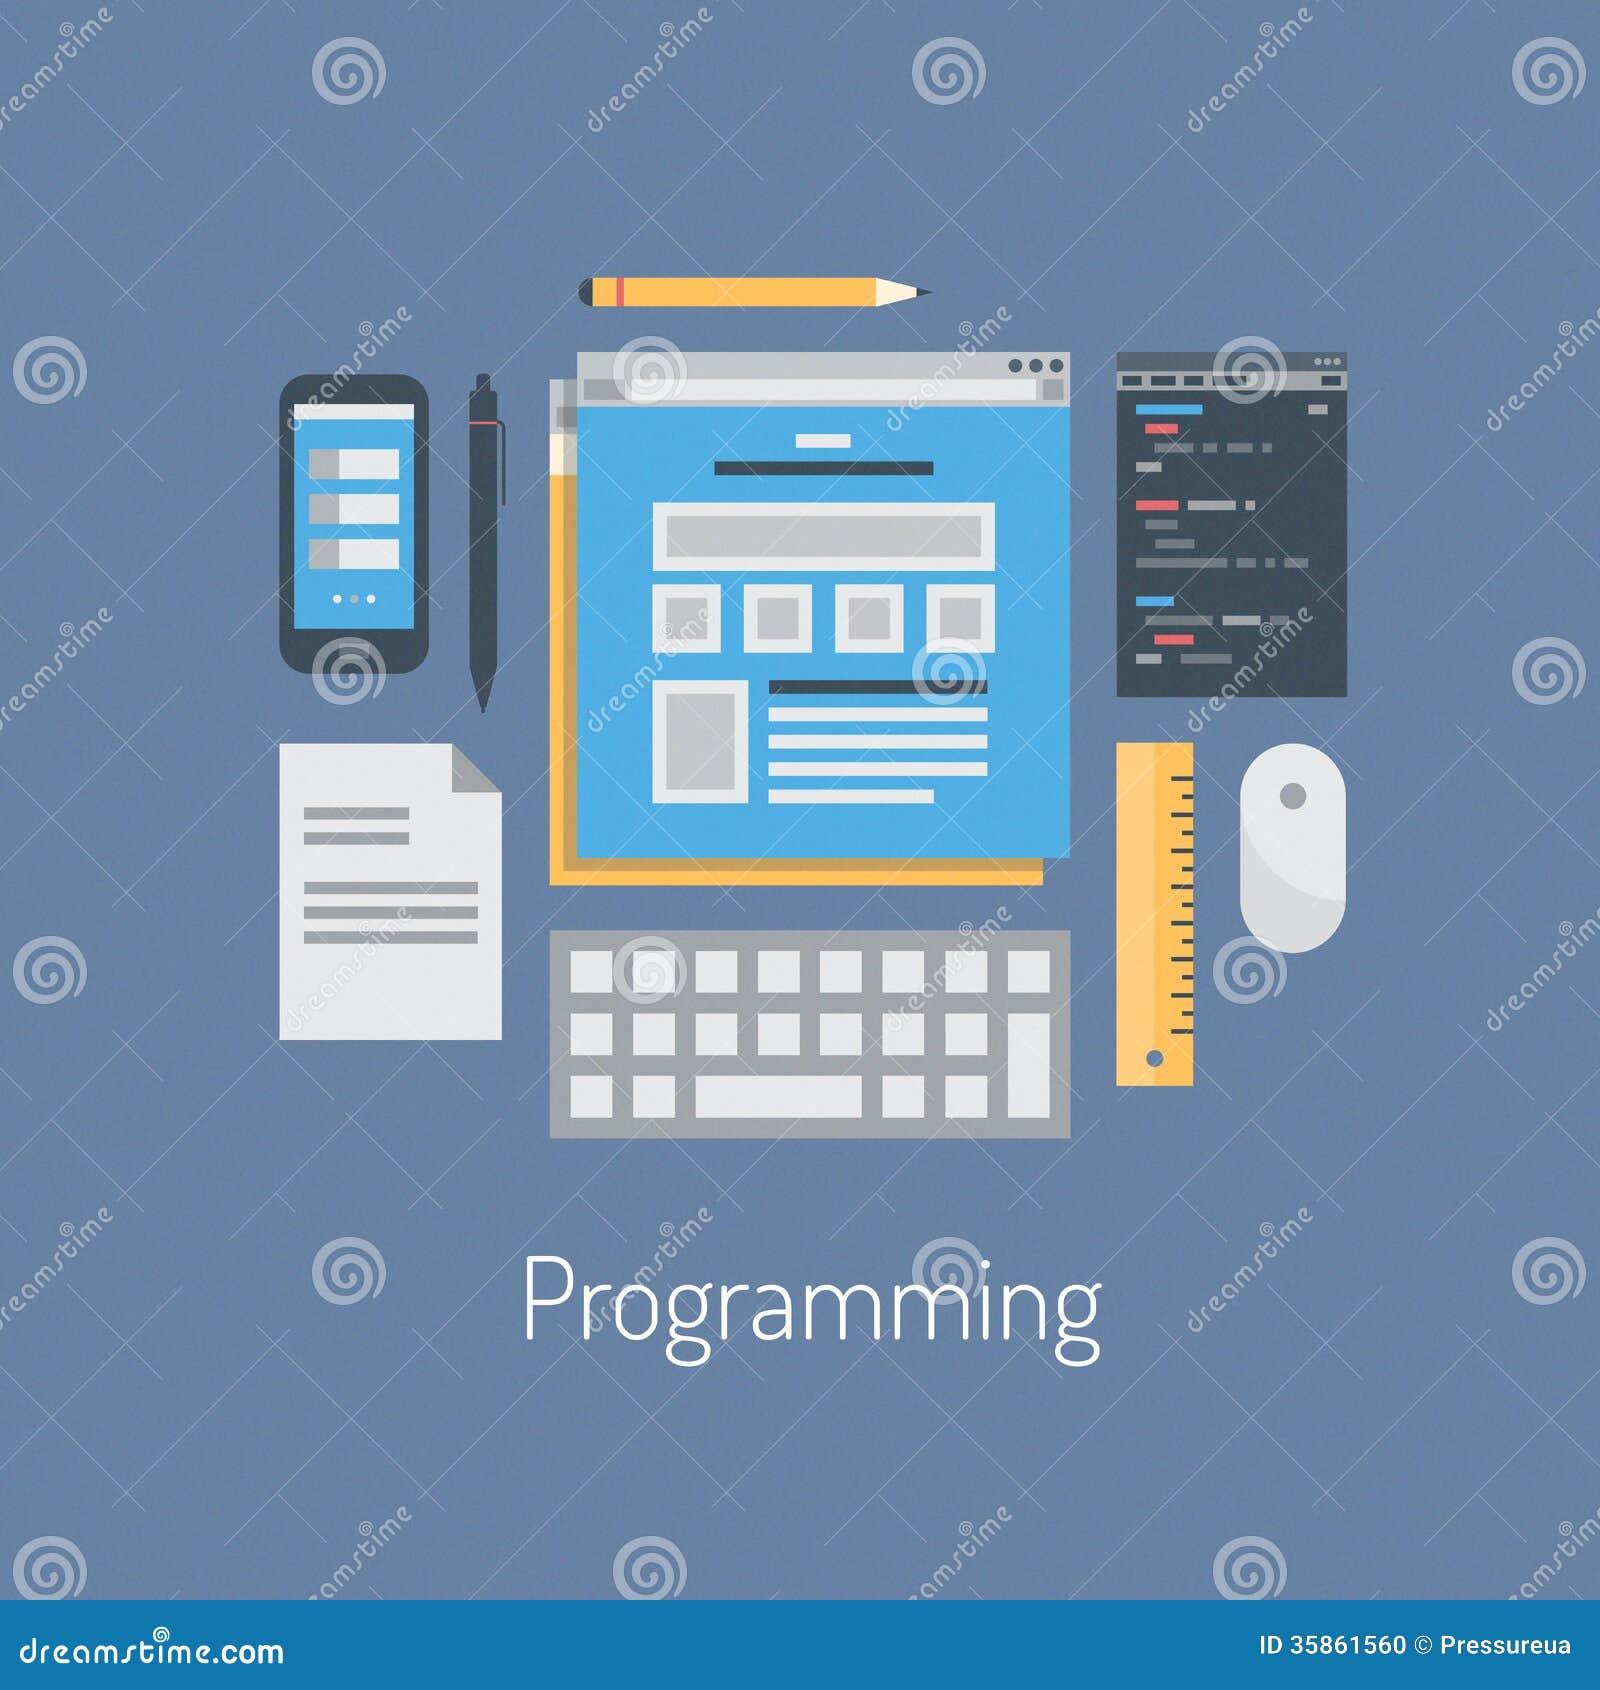 Web And HTML Programming Flat Illustration Stock Photo - Image ...